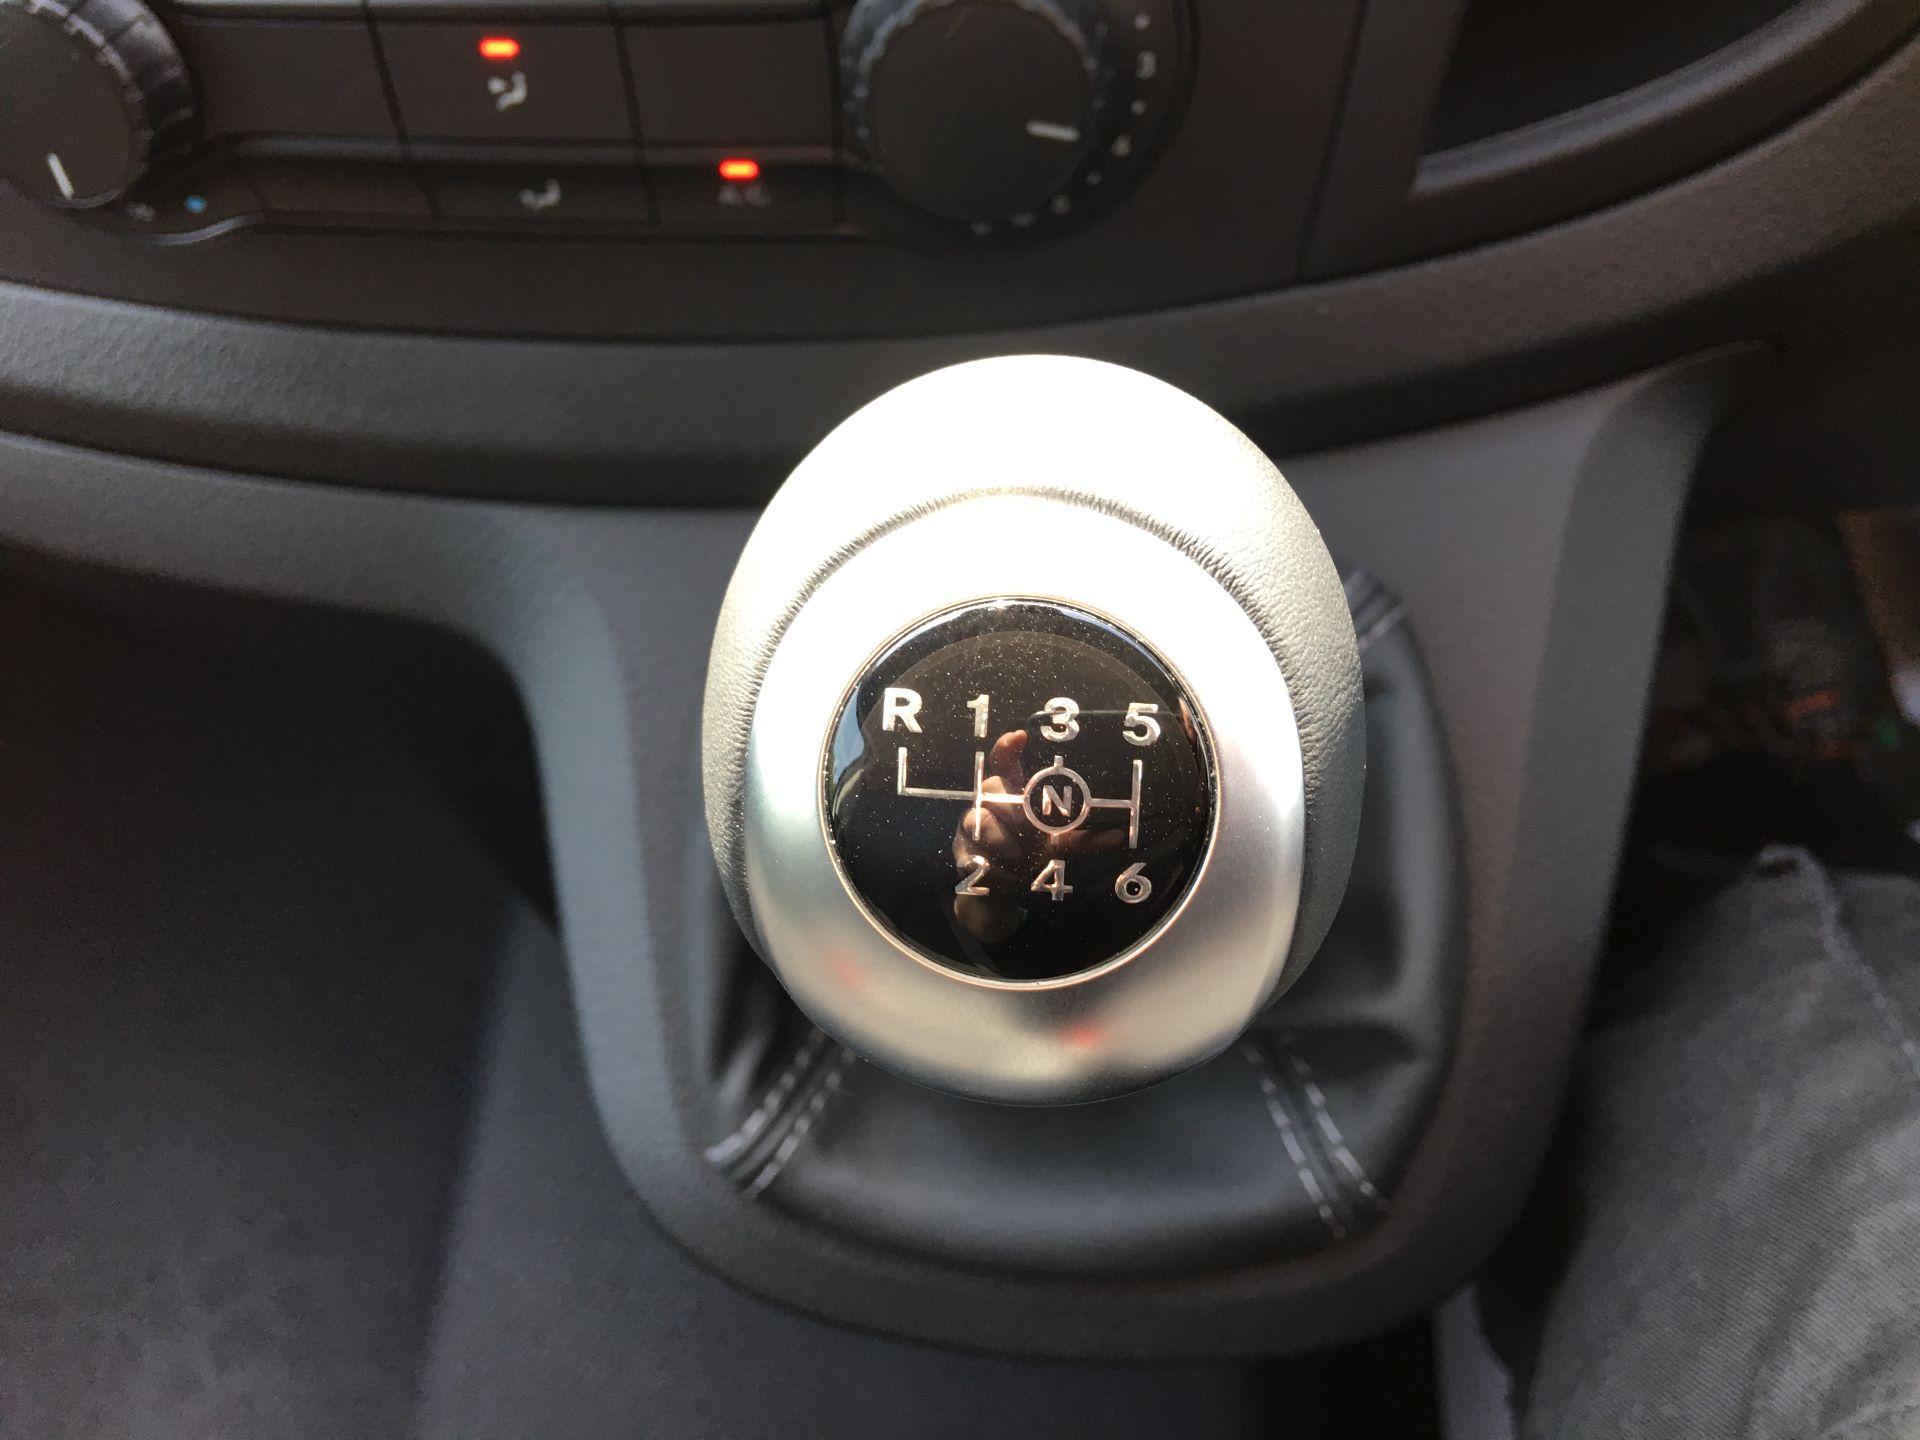 2019 Mercedes-Benz Vito LONG 111 CDI VAN EURO 5/6 (YN19ZGM) Image 4